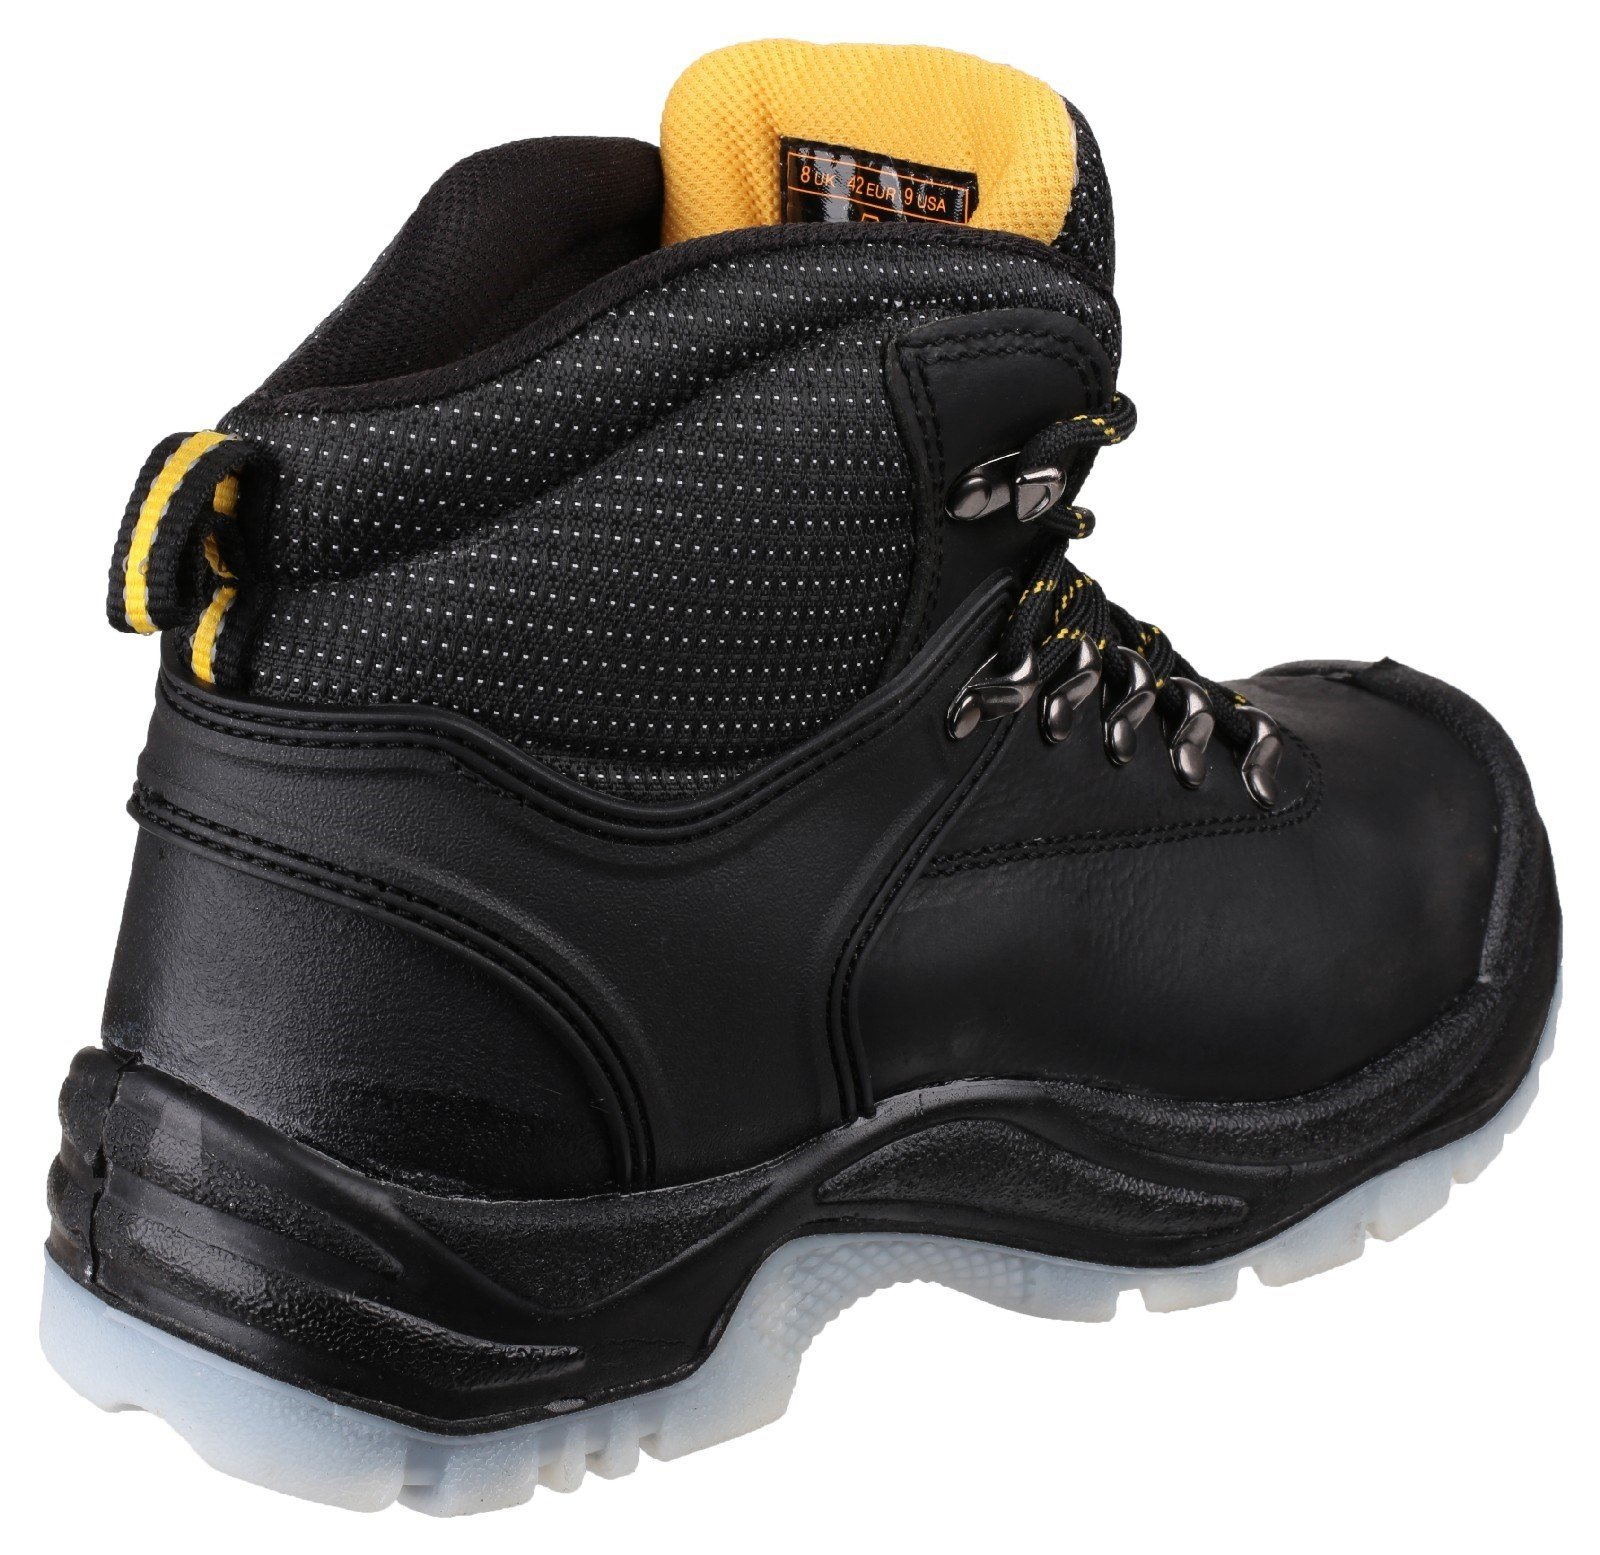 Amblers Unisex Safety Antistatic Lace Up Hiker Boot Black 15018 - Black 7